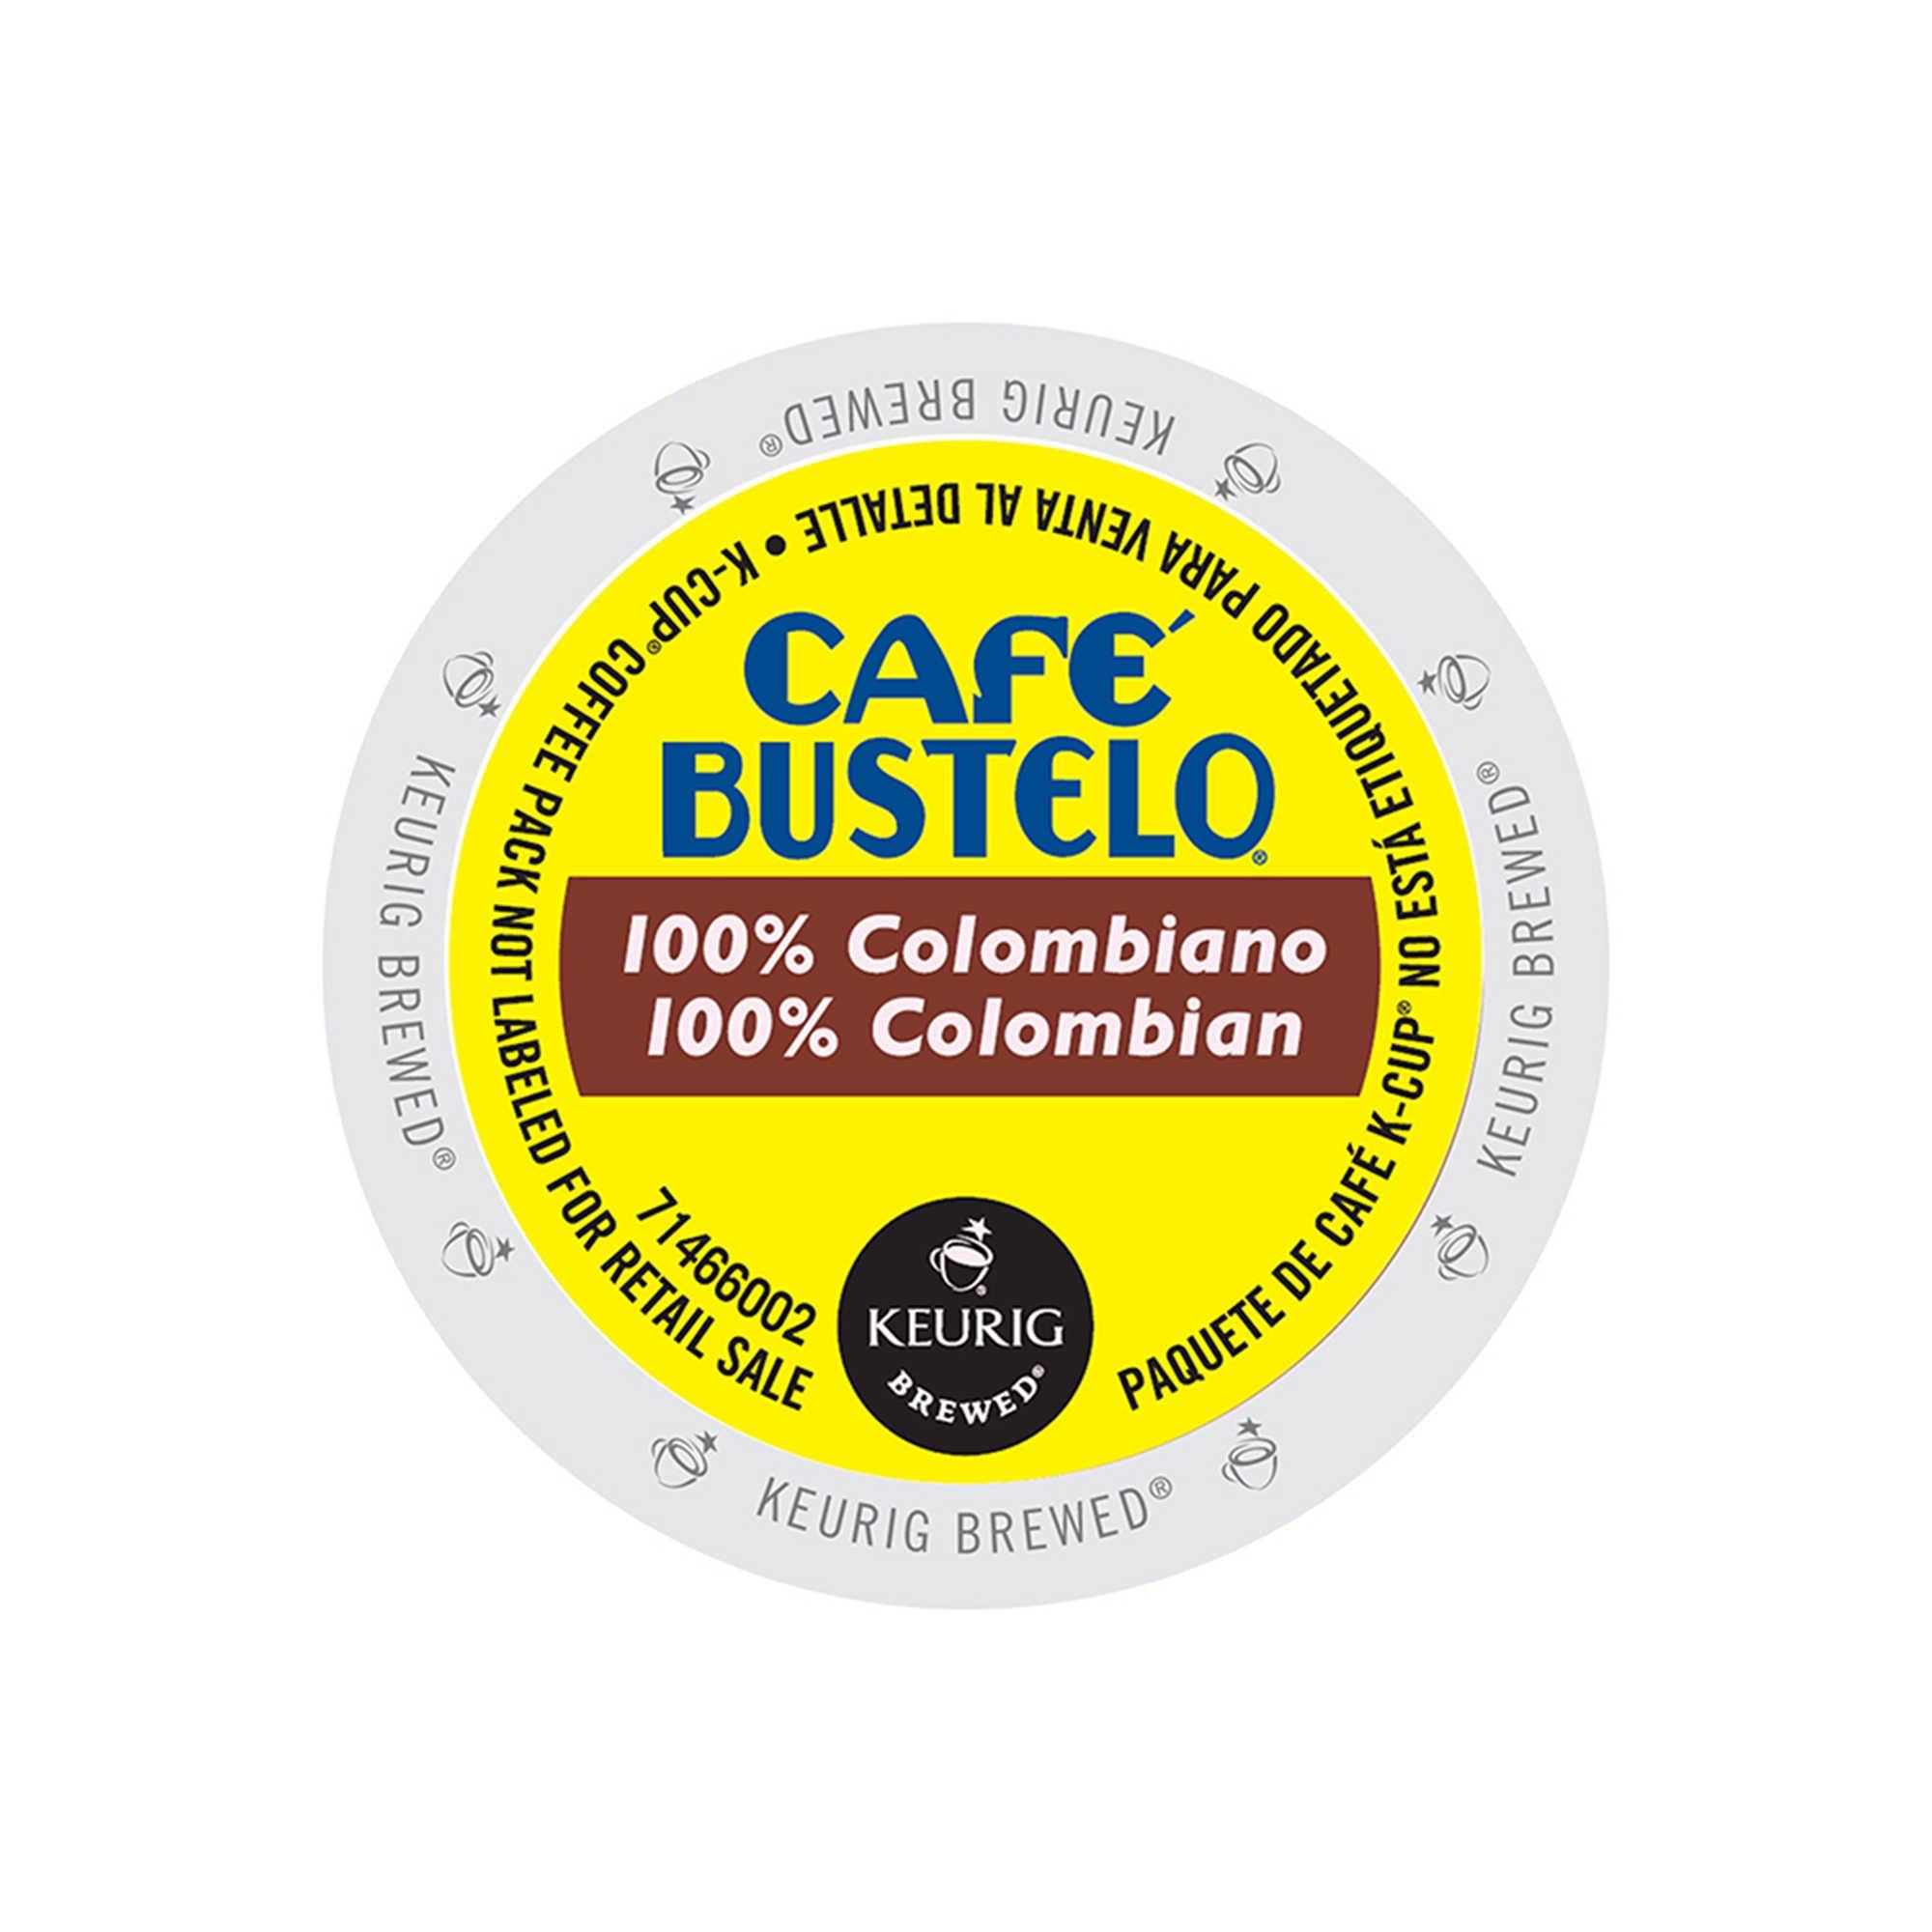 Café Bustelo 100 % Colombian Coffee 96 K Cup Packs by Café Bustelo